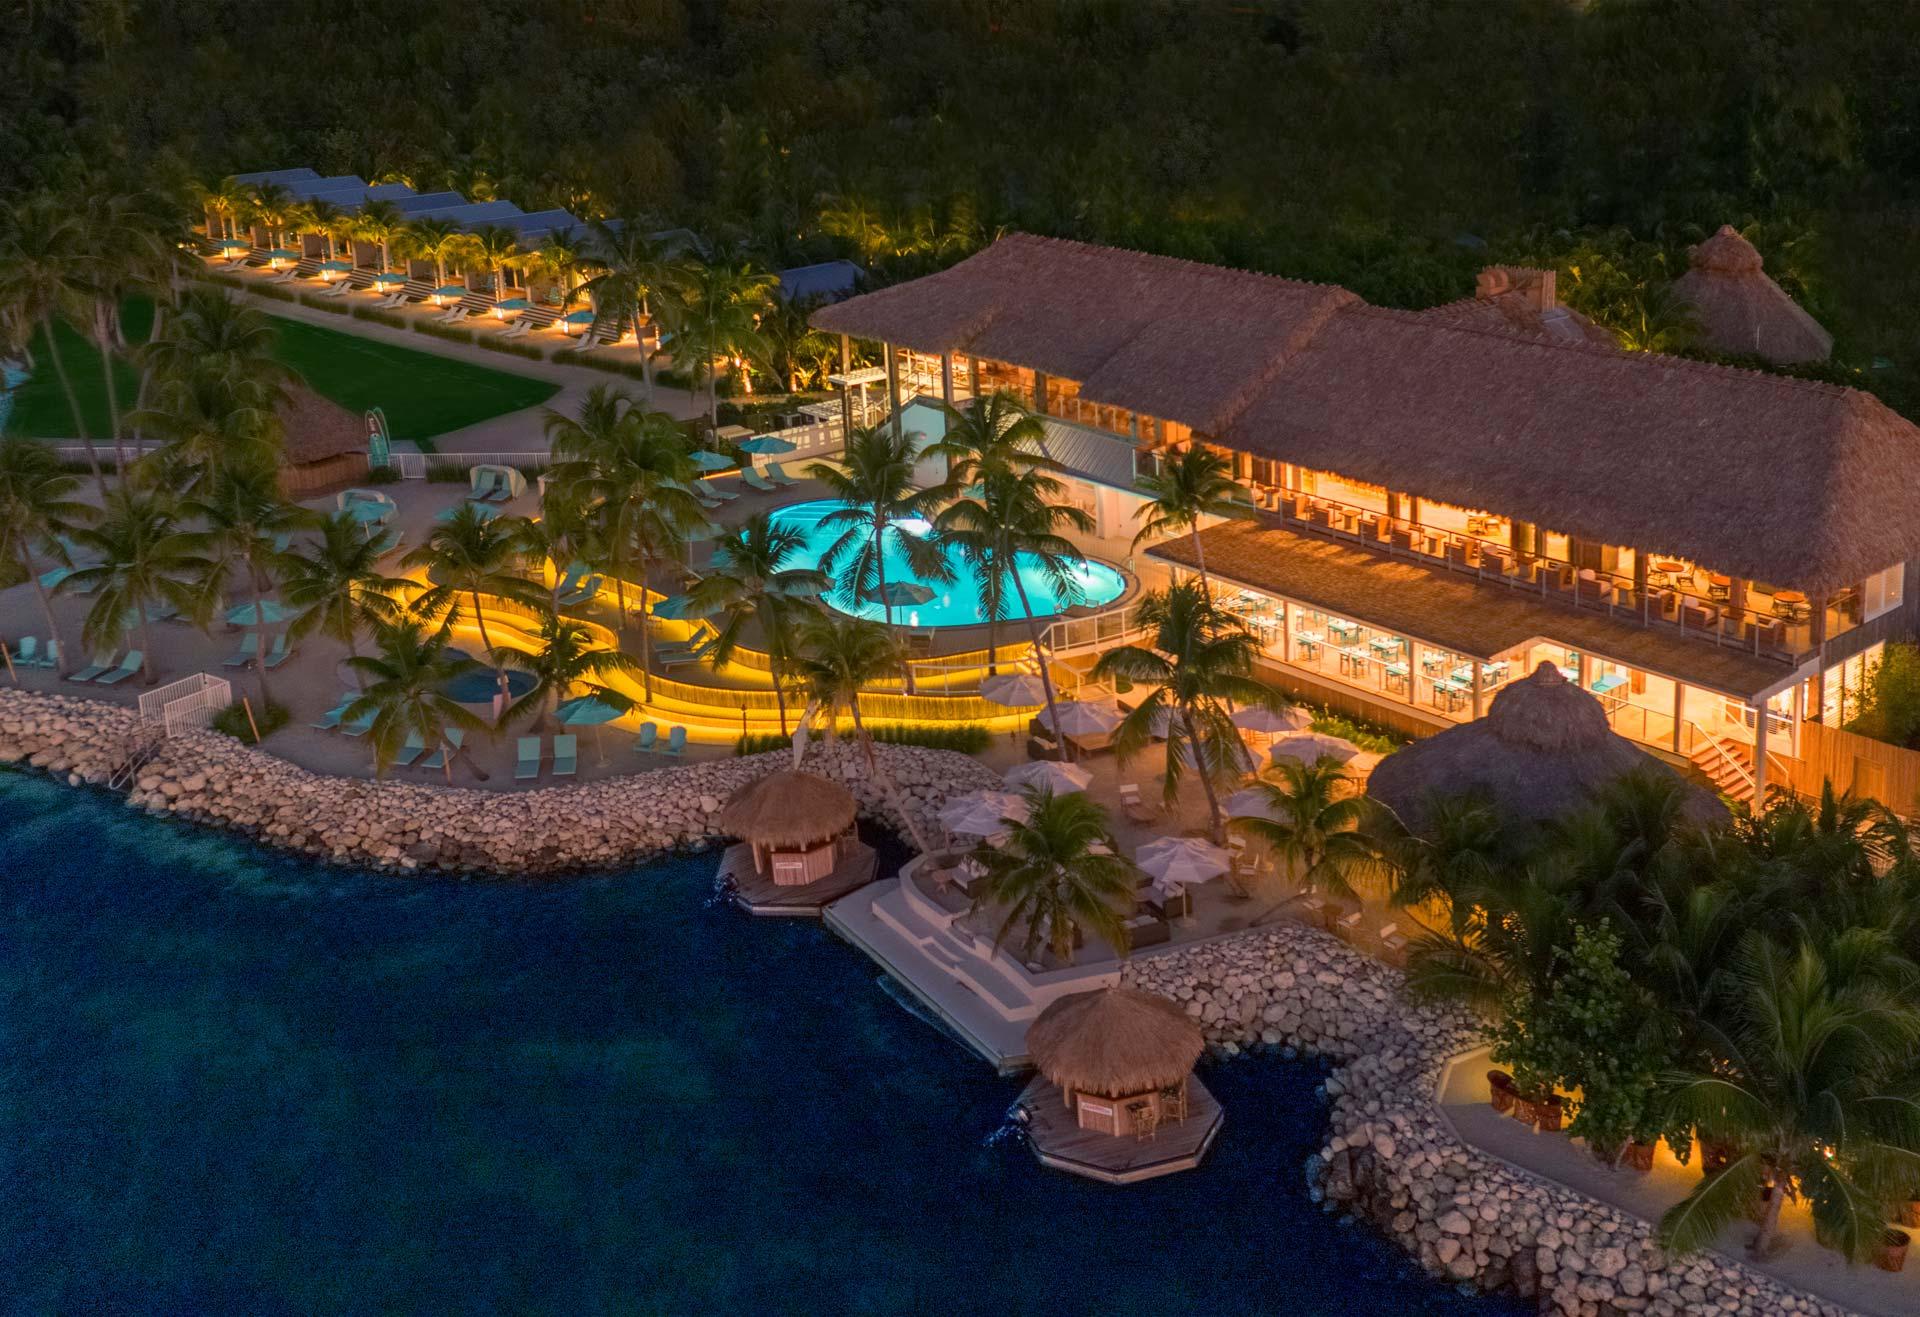 bungalows key largo resort overhead view at night